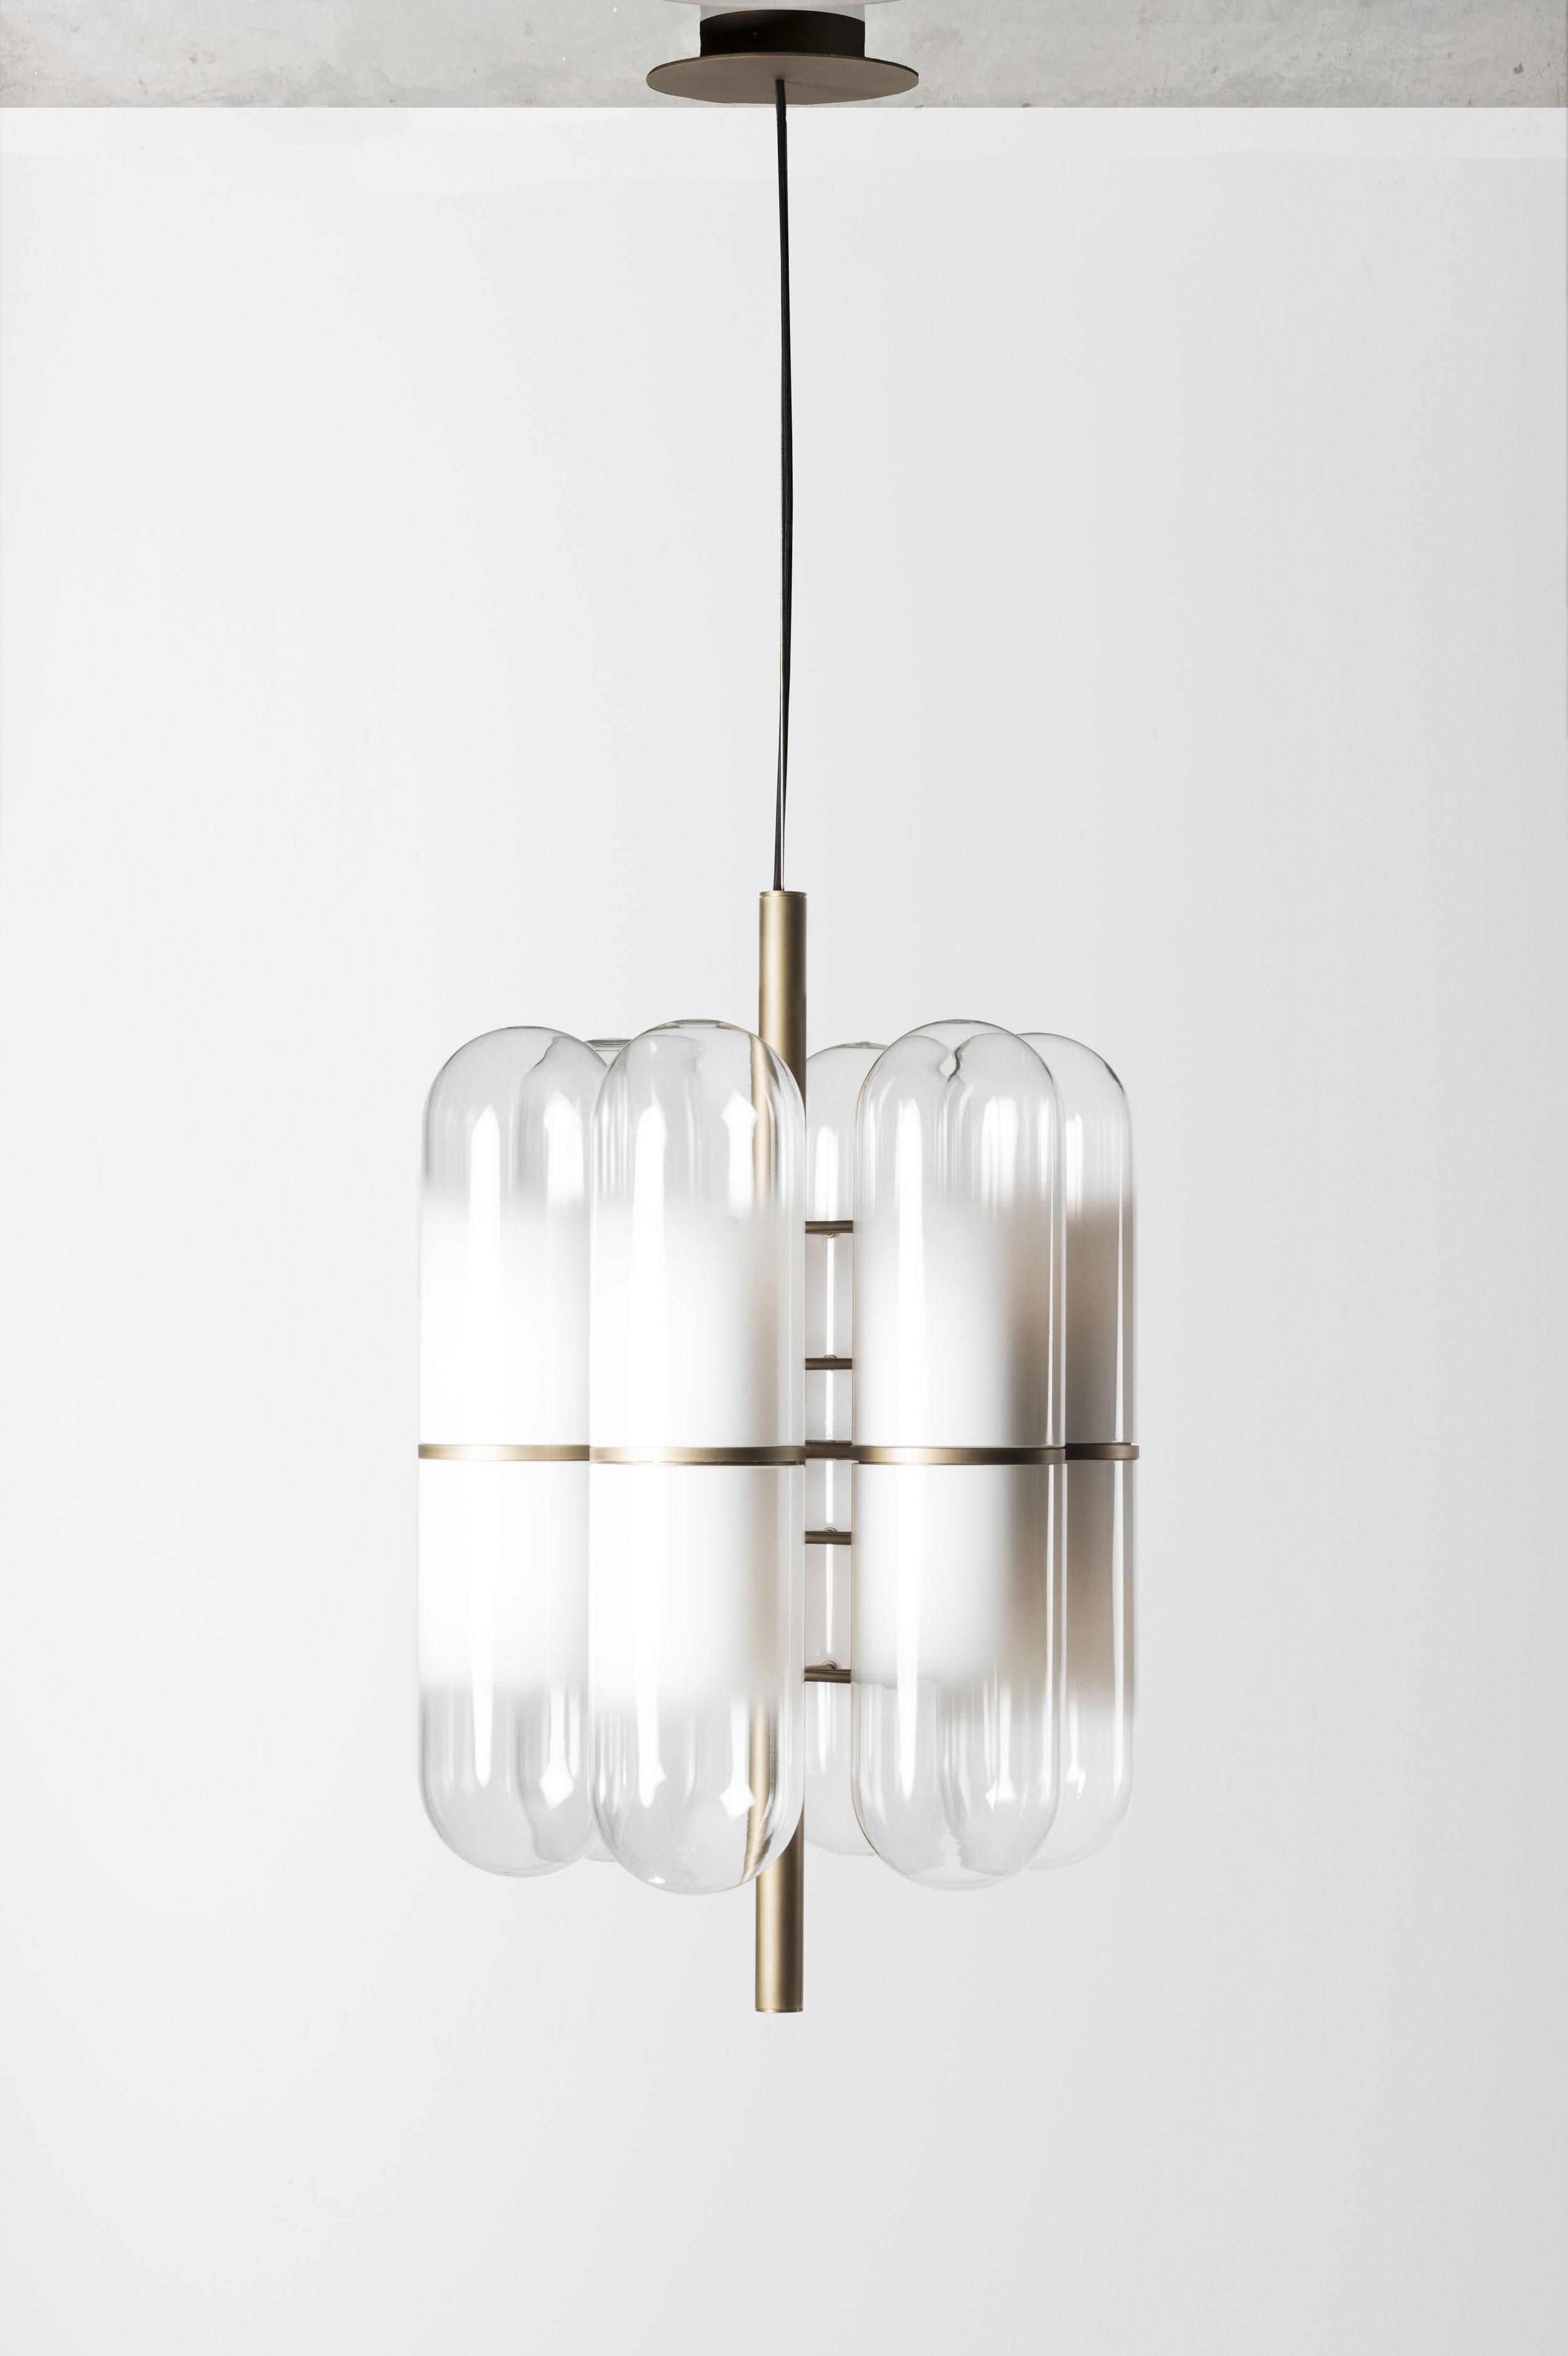 Federico Peri_Charlotte lamp M_Nilufar gallery_©Daniele Iodice.jpg